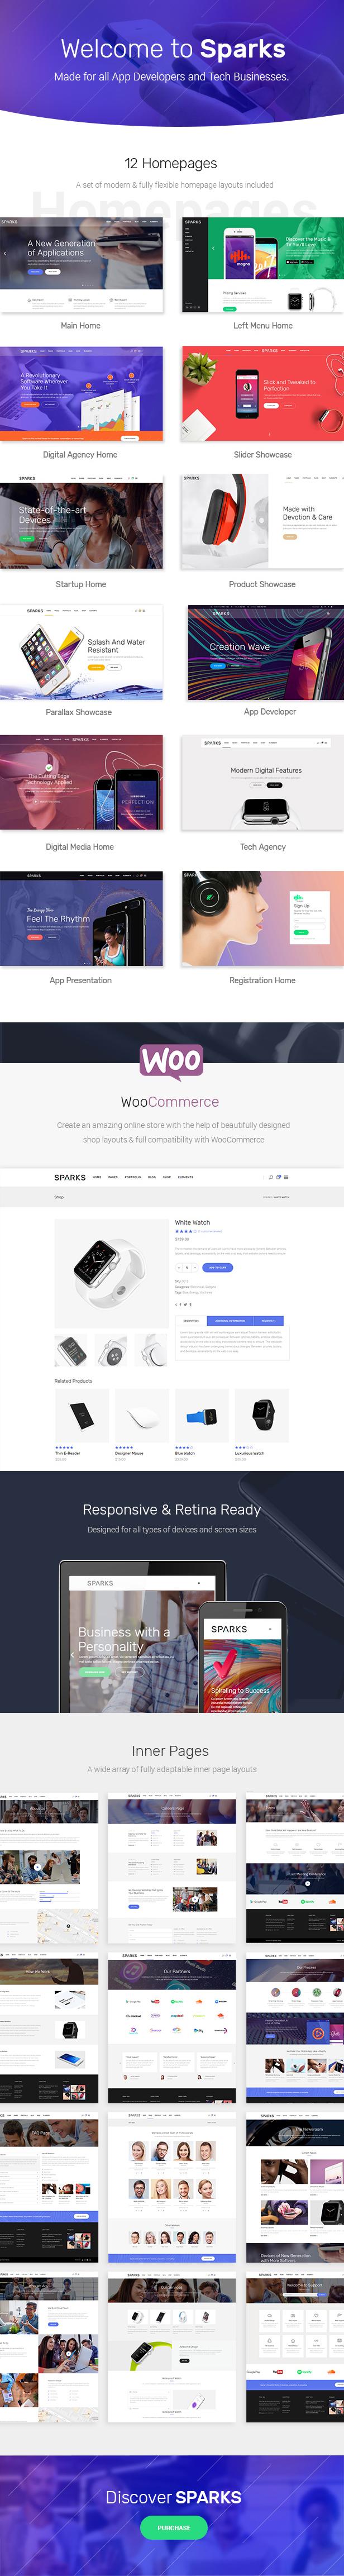 Sparks - App Development & Startup Theme - 1